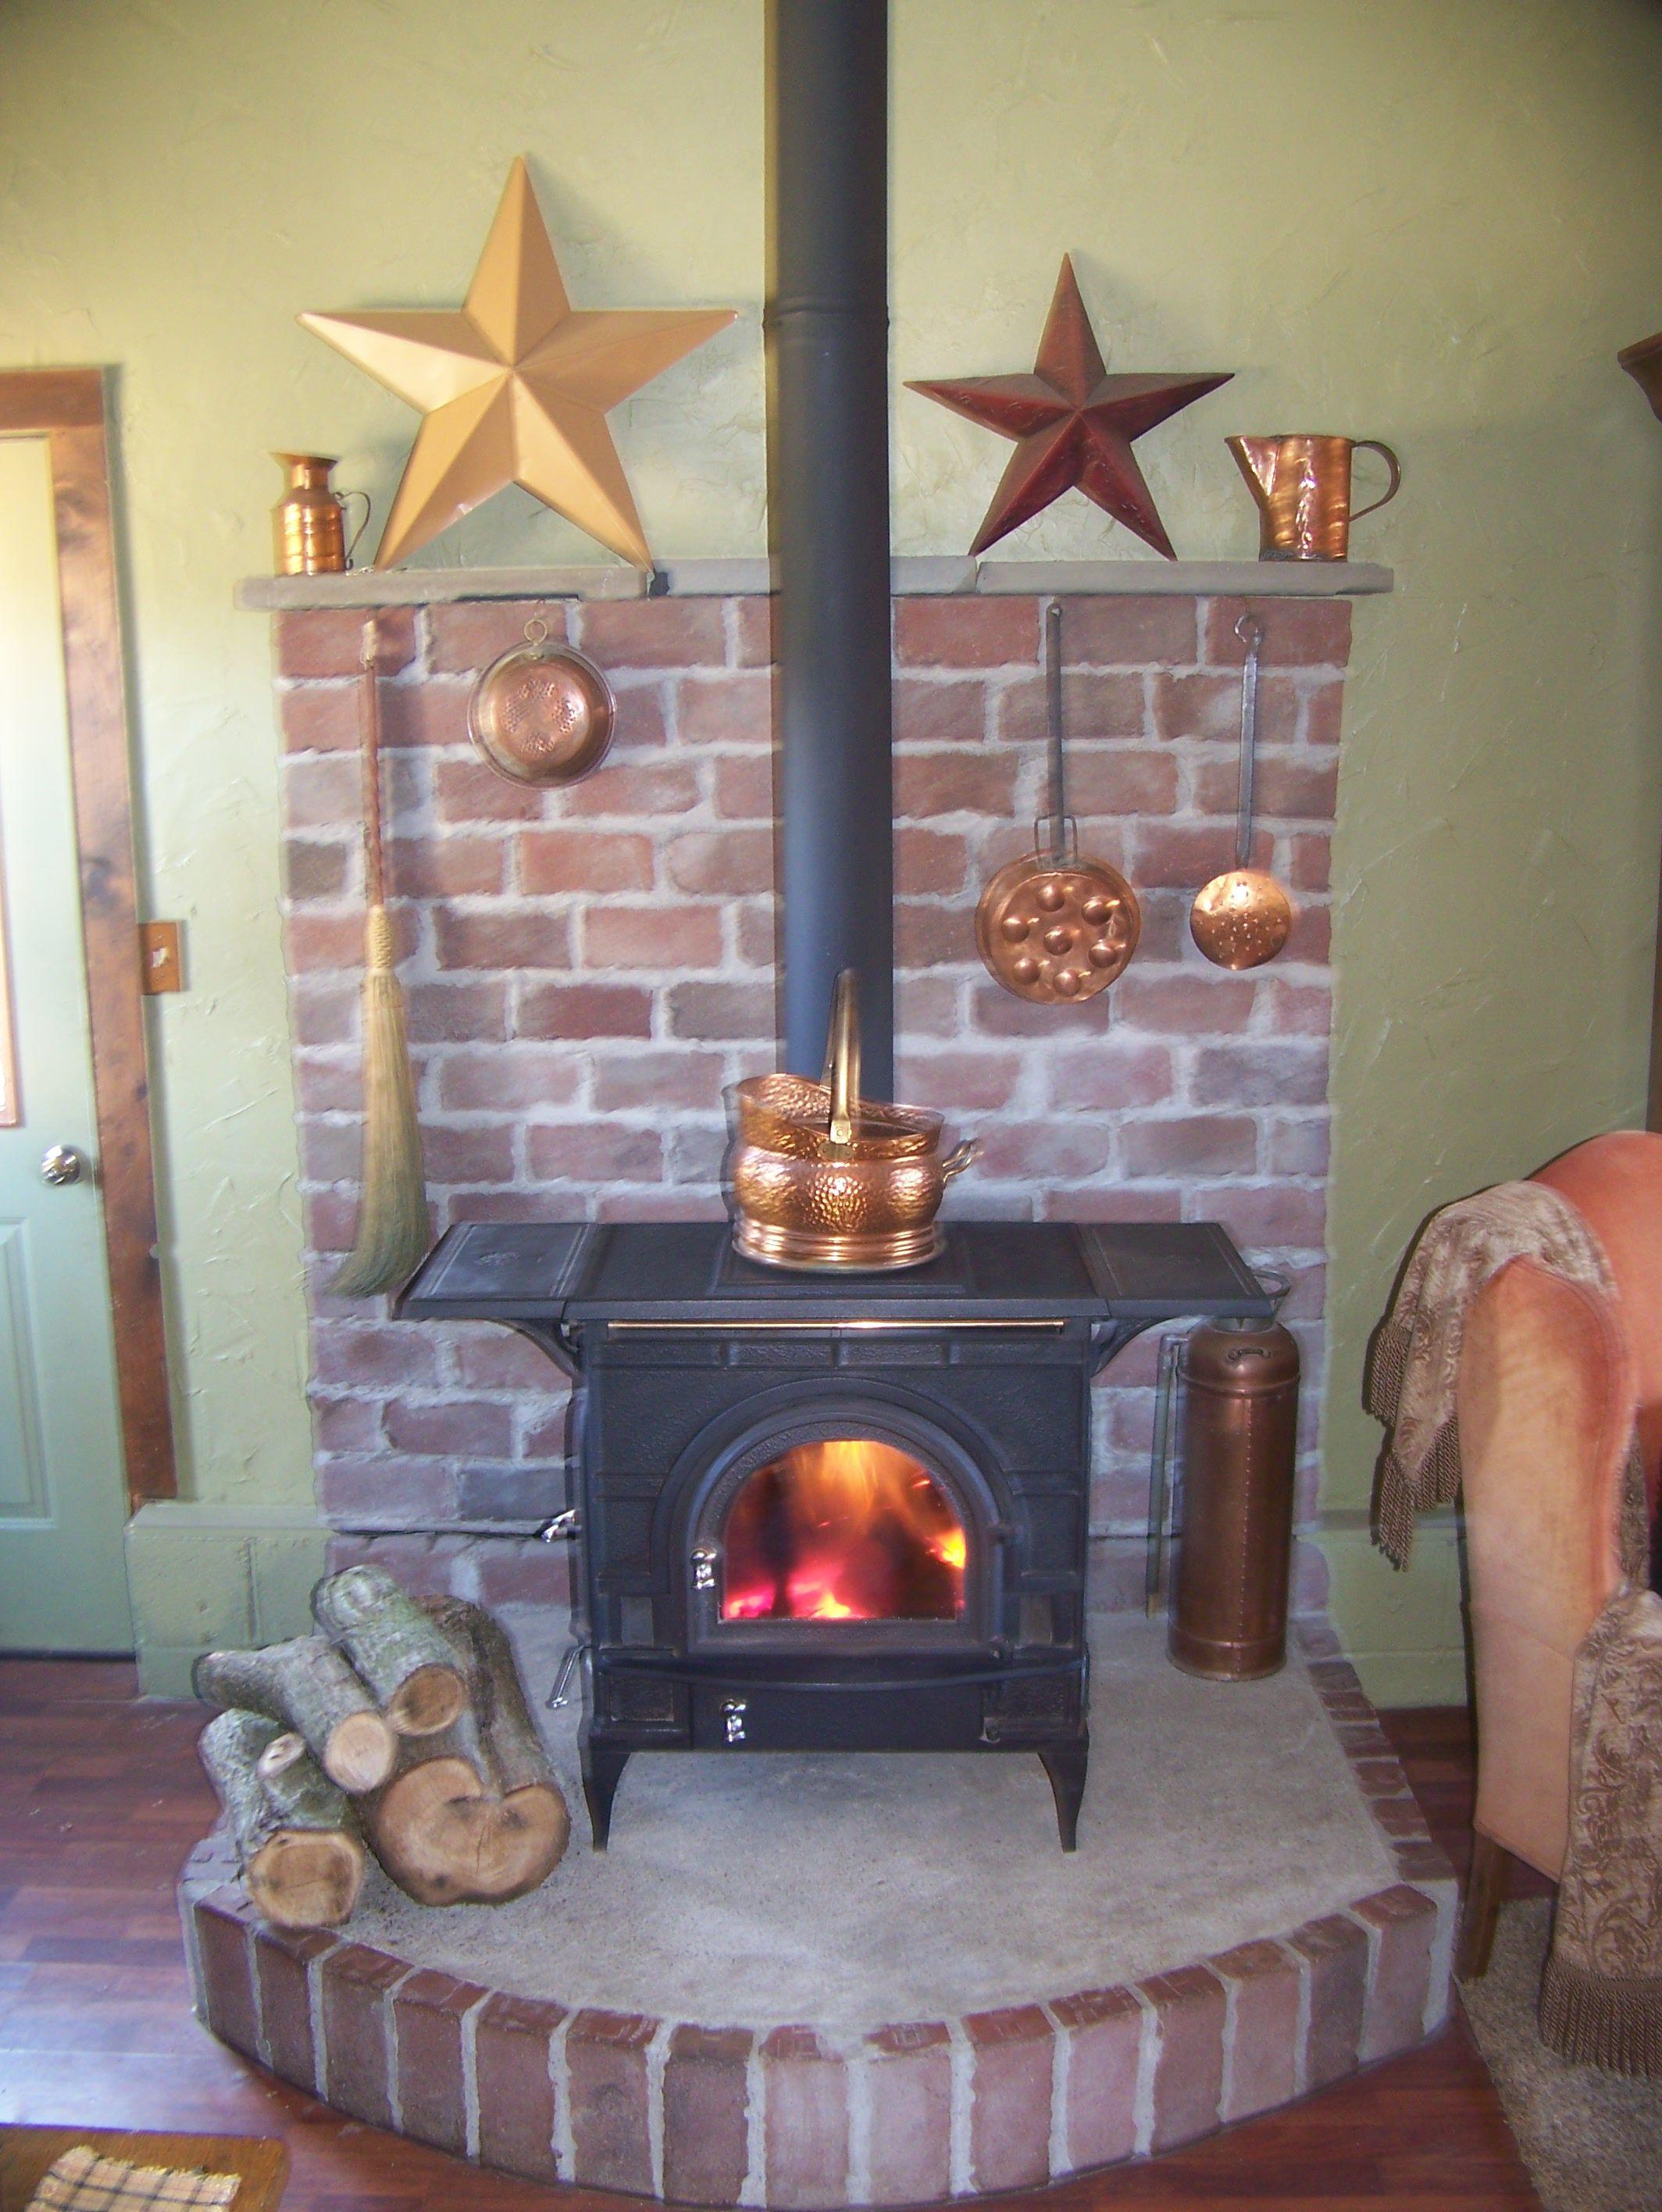 Our Woodstove Hearth Wood Stove Wood Stove Hearth Wood Stove Fireplace